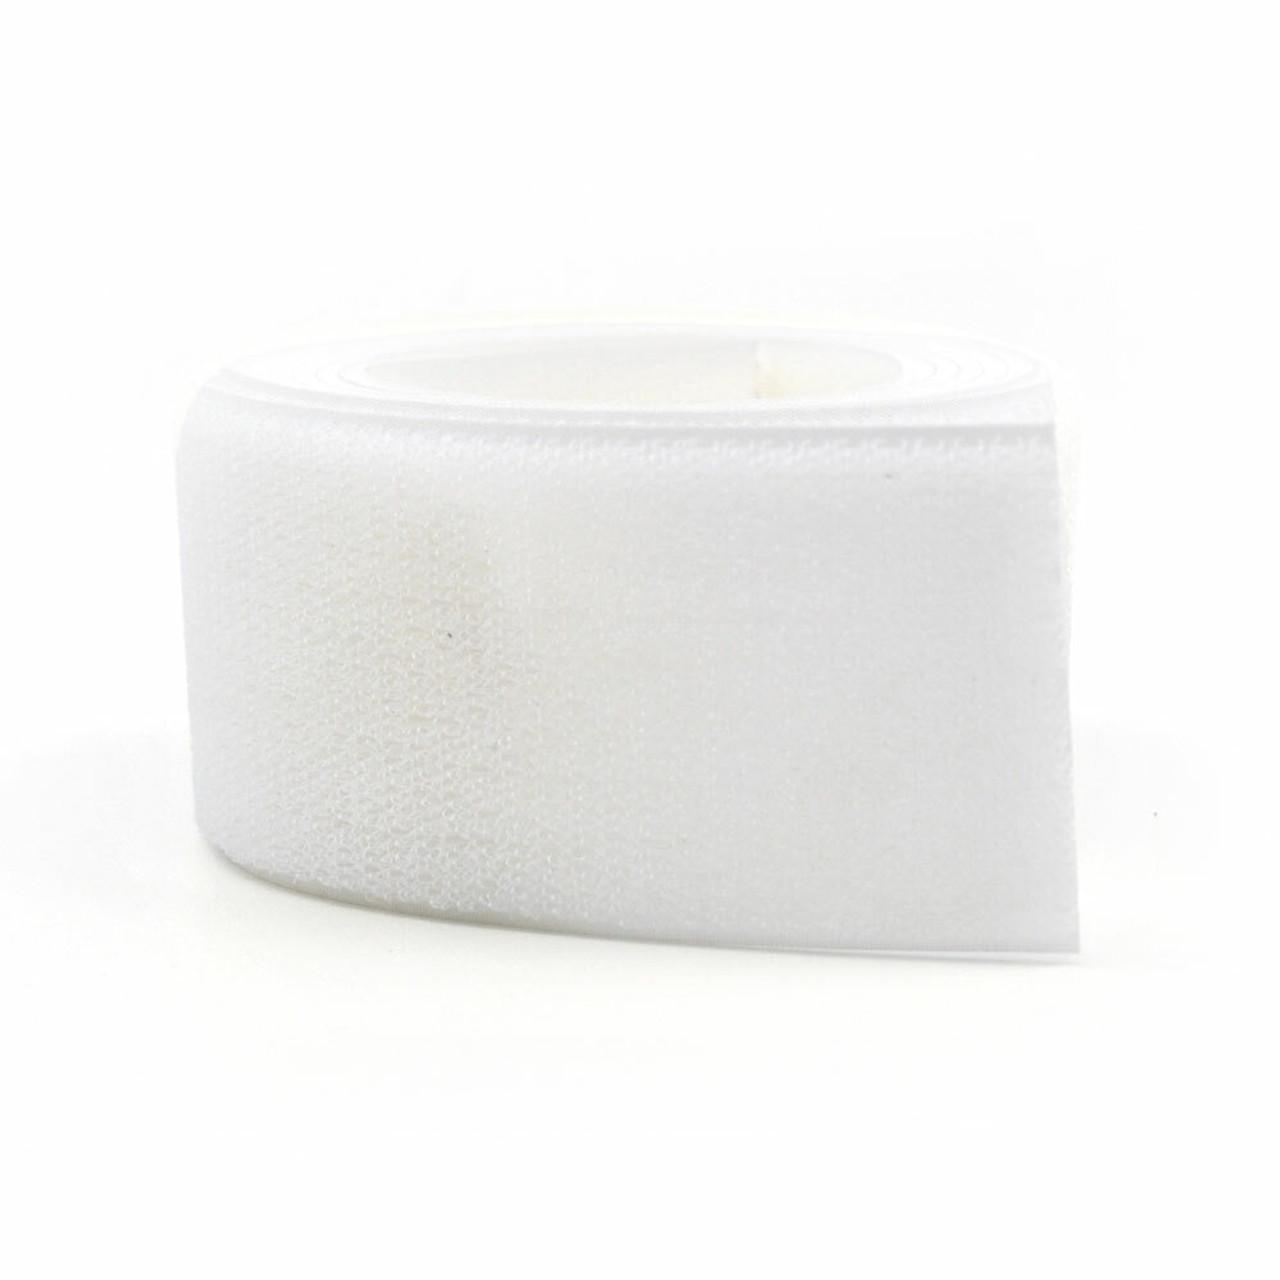 VELCRO Brand Polyester Sew-On Tape- Mil Spec White Loop / Velcro Fasteners